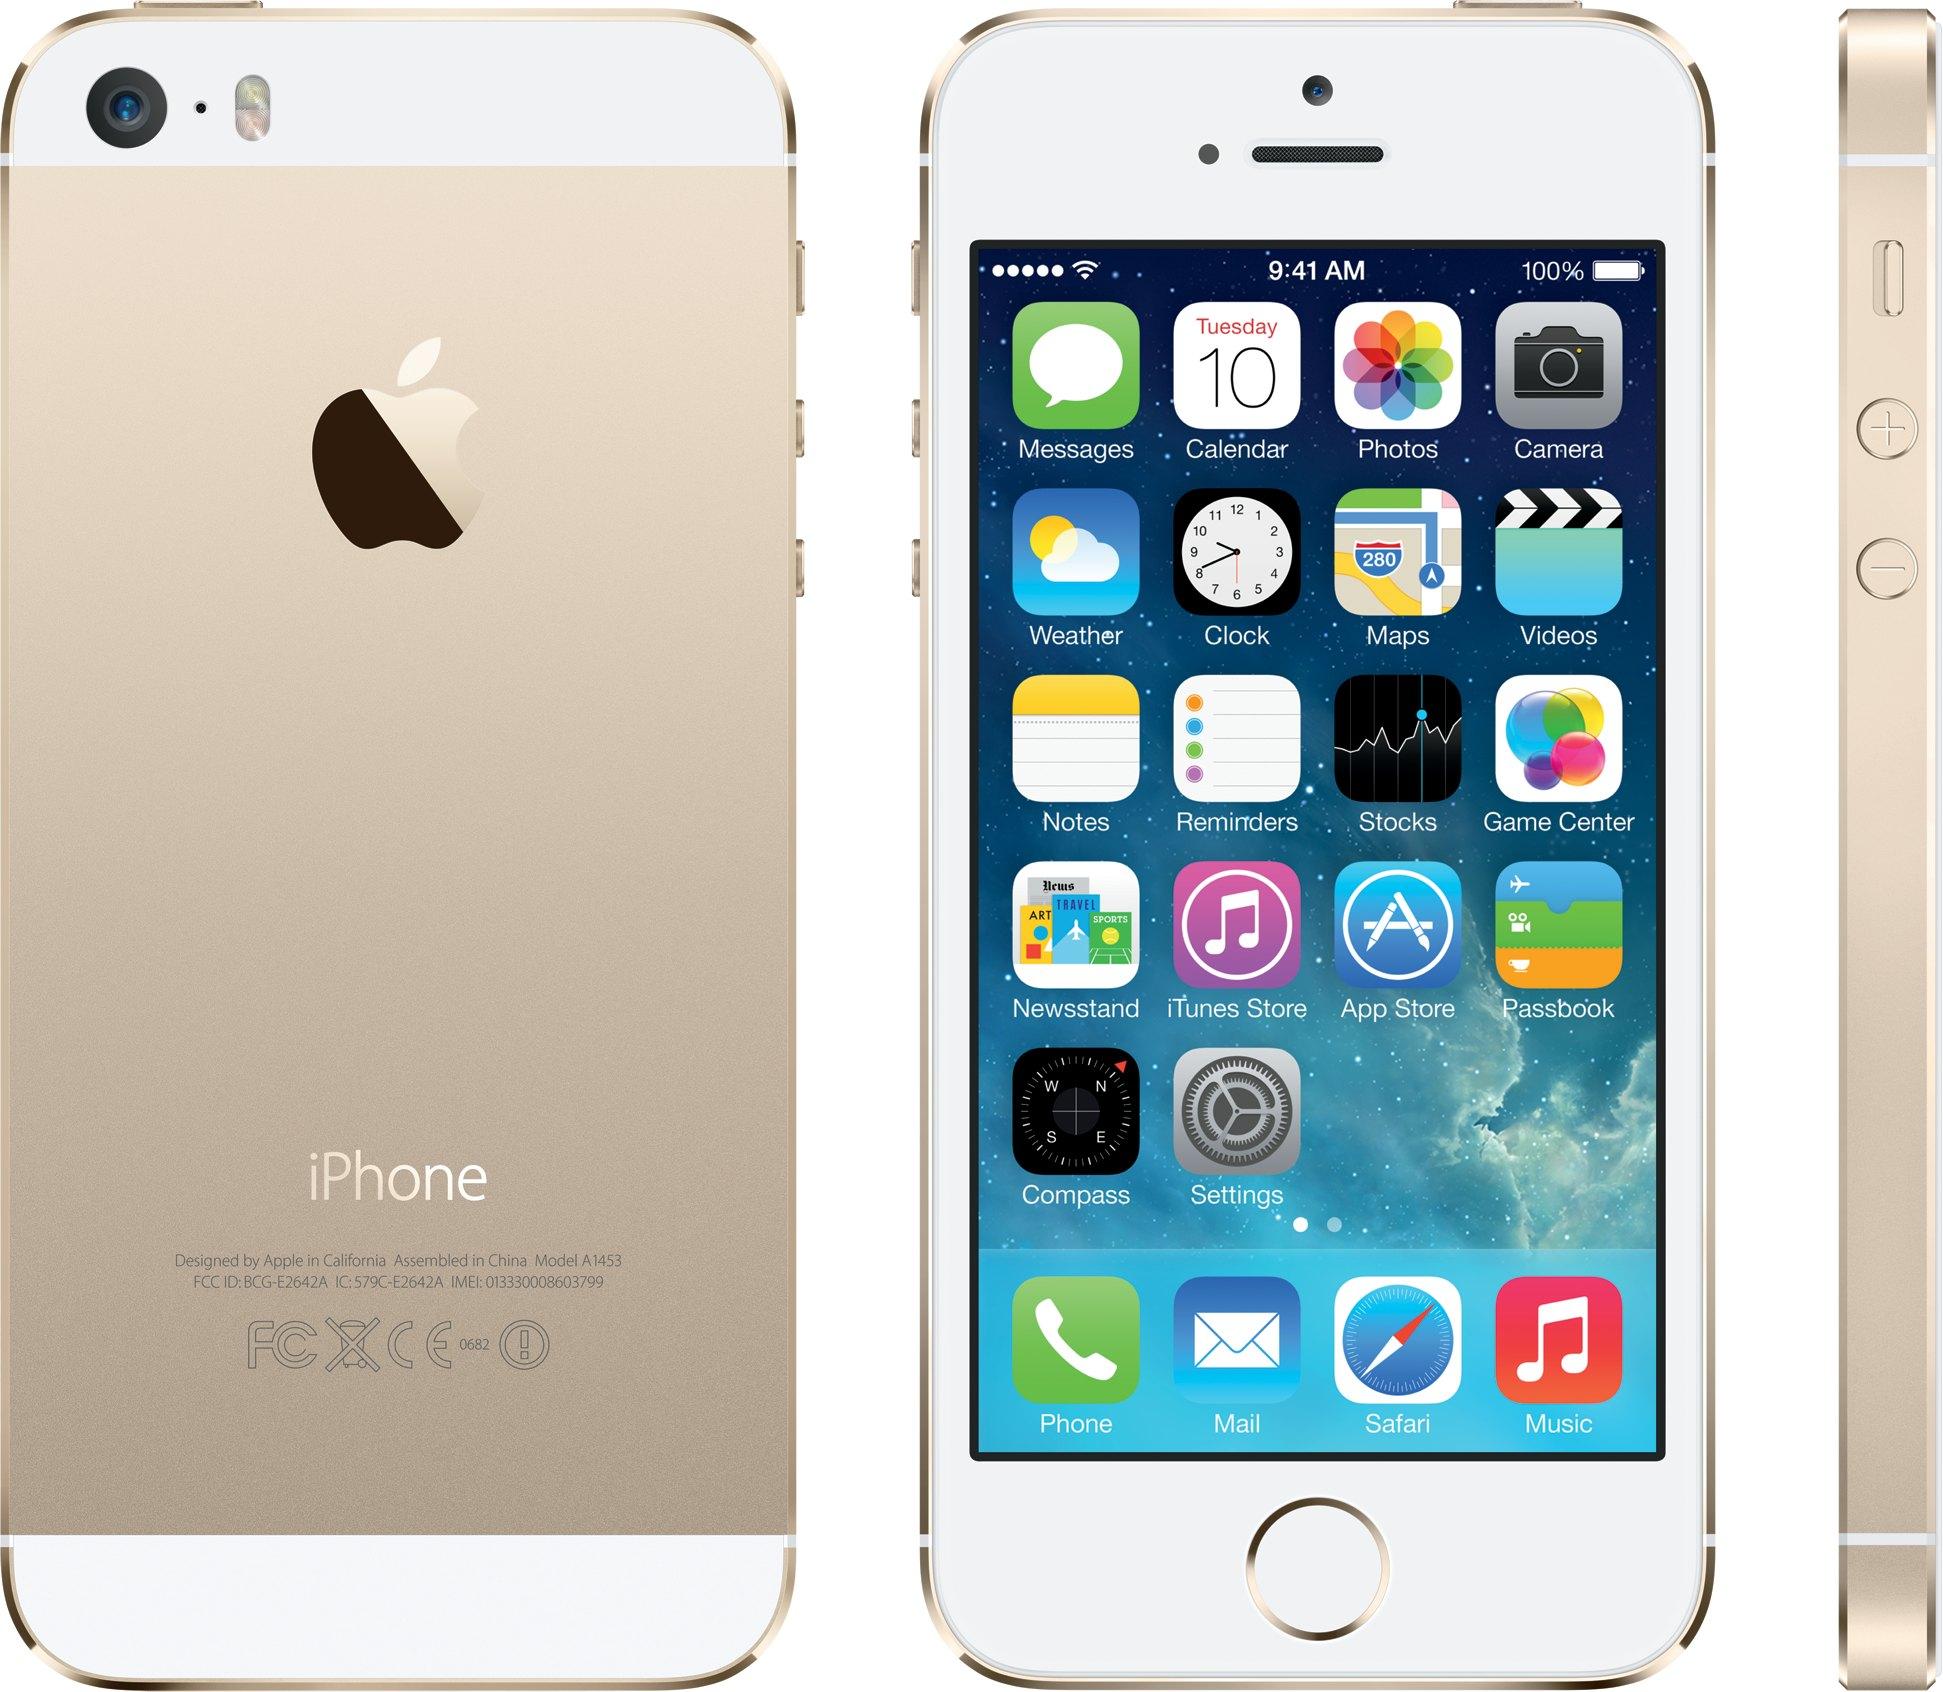 8629f3e04bb57 Продам   Купить б/у Apple iPhone 5s (16GB) Gold в Вологде • Цена ...